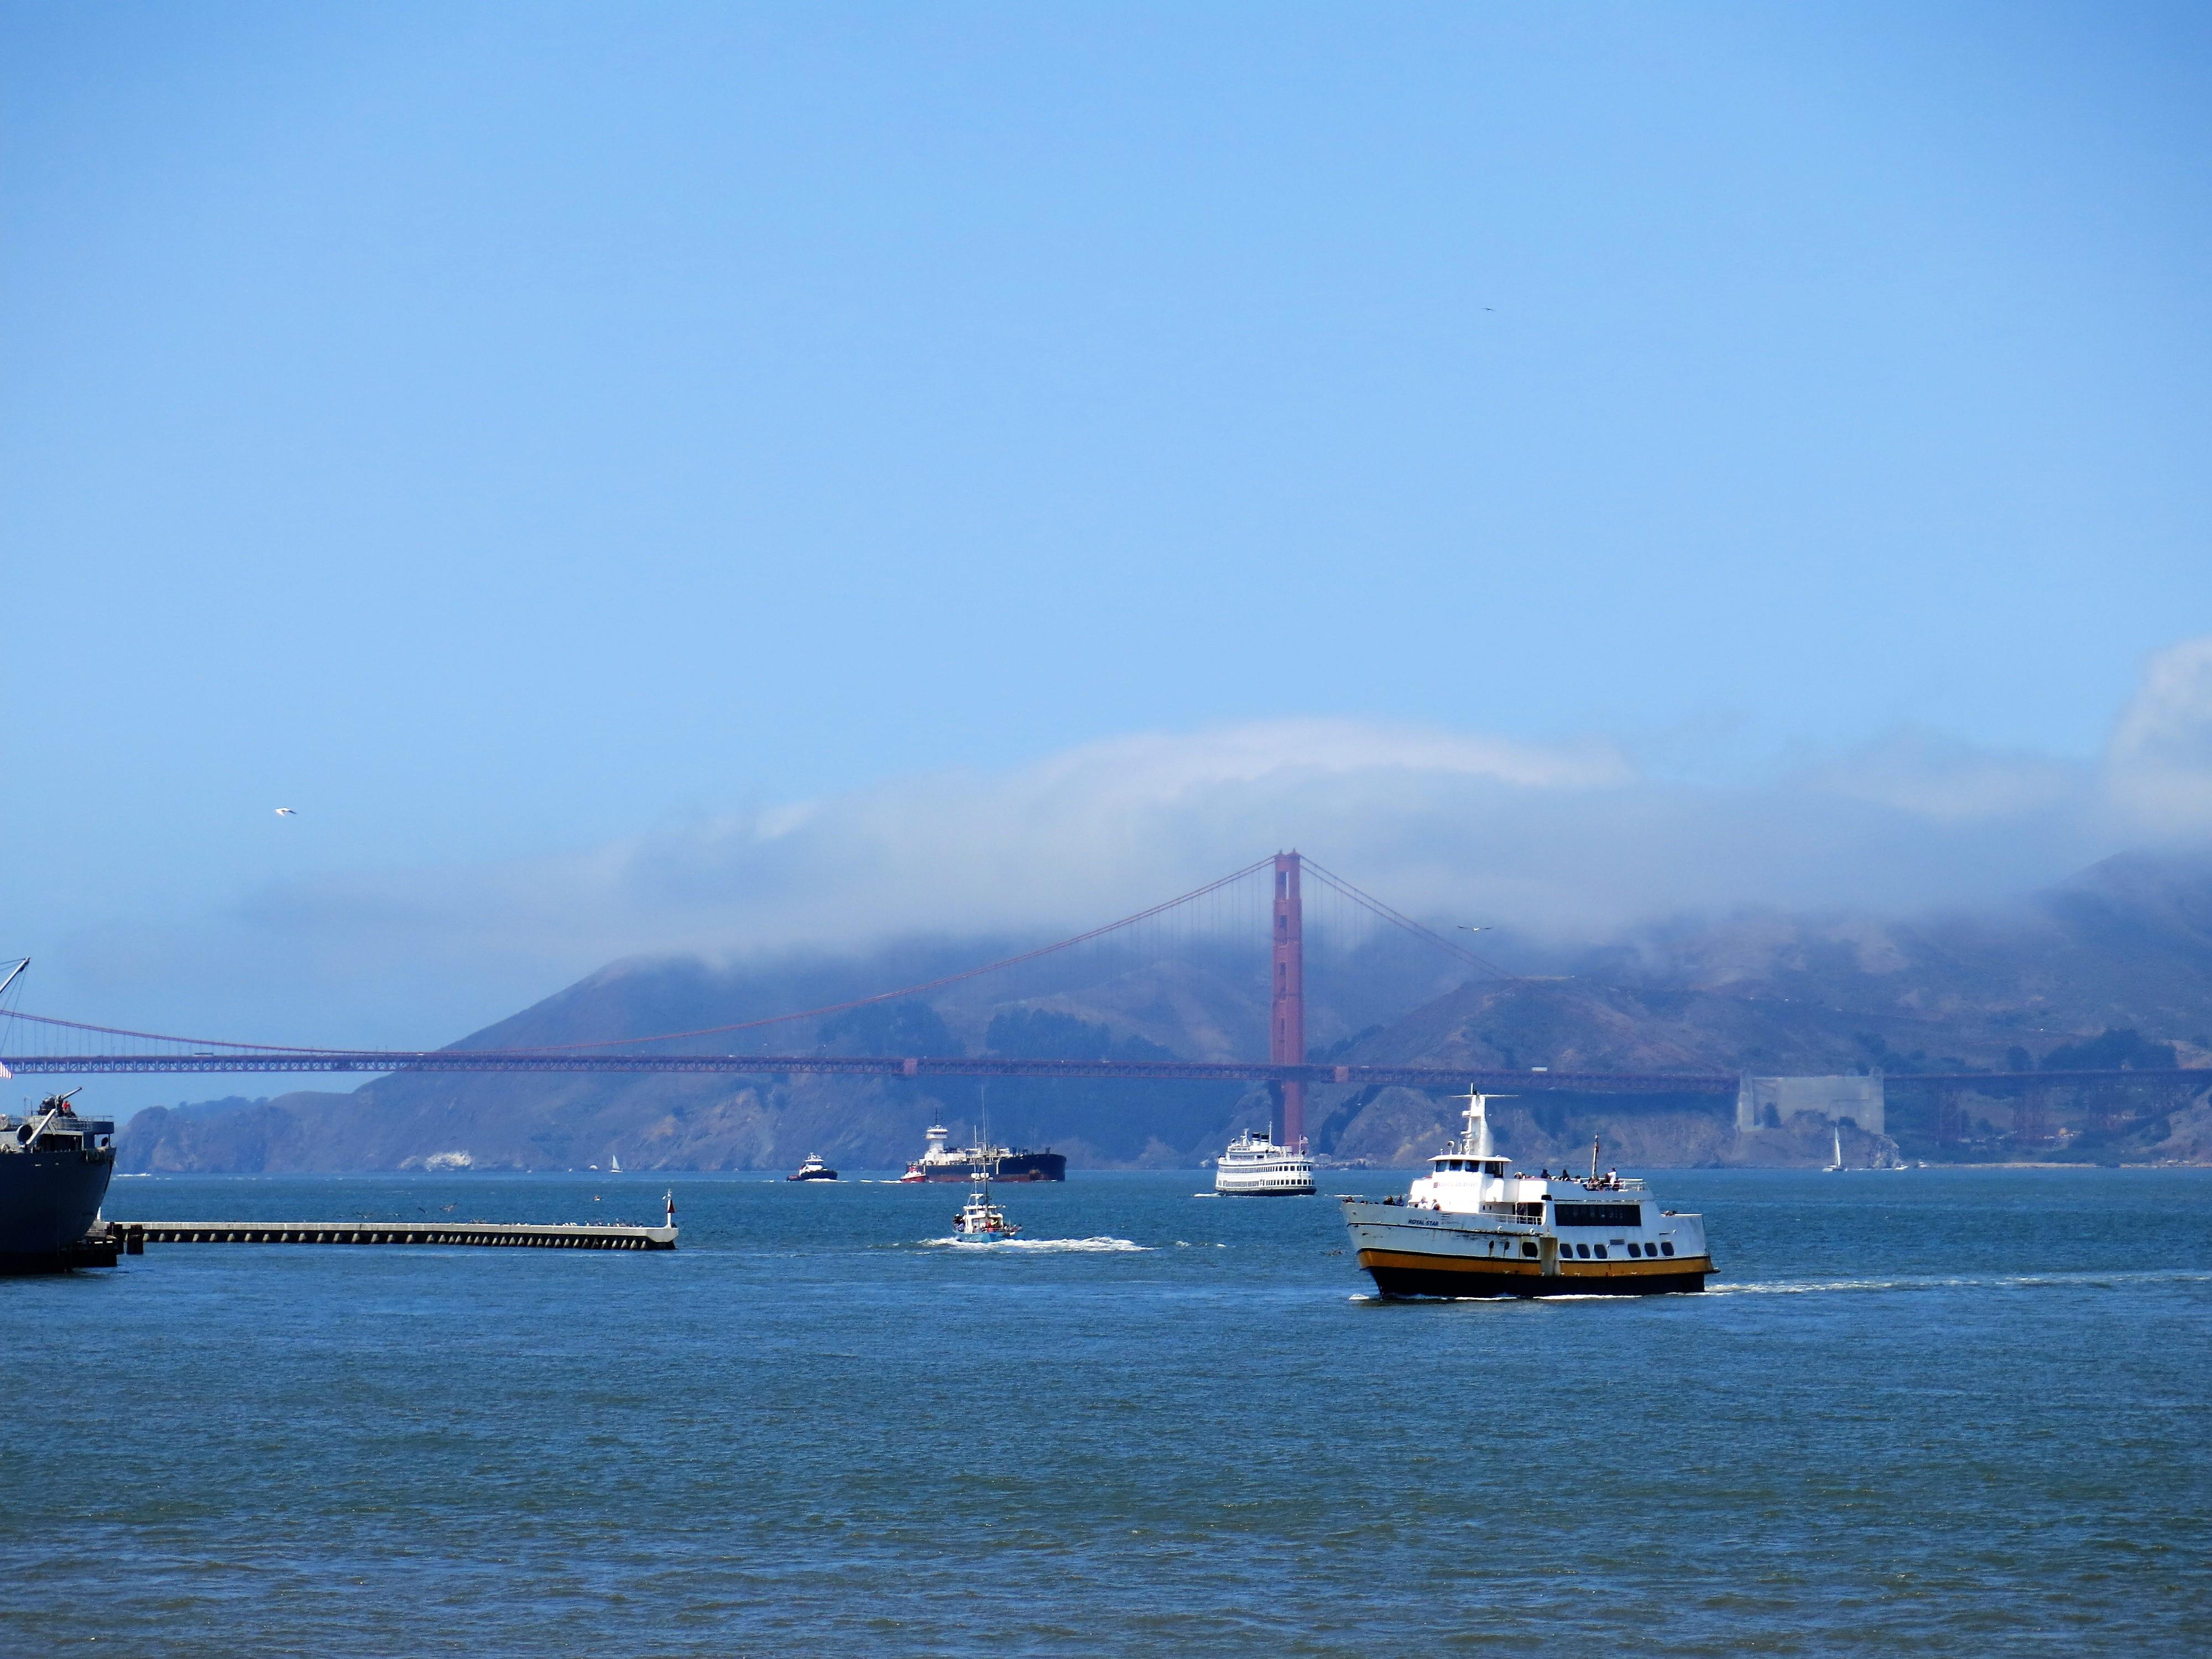 FISHERMANS WARF SAN FRANCISCO CALIFORNIA USA